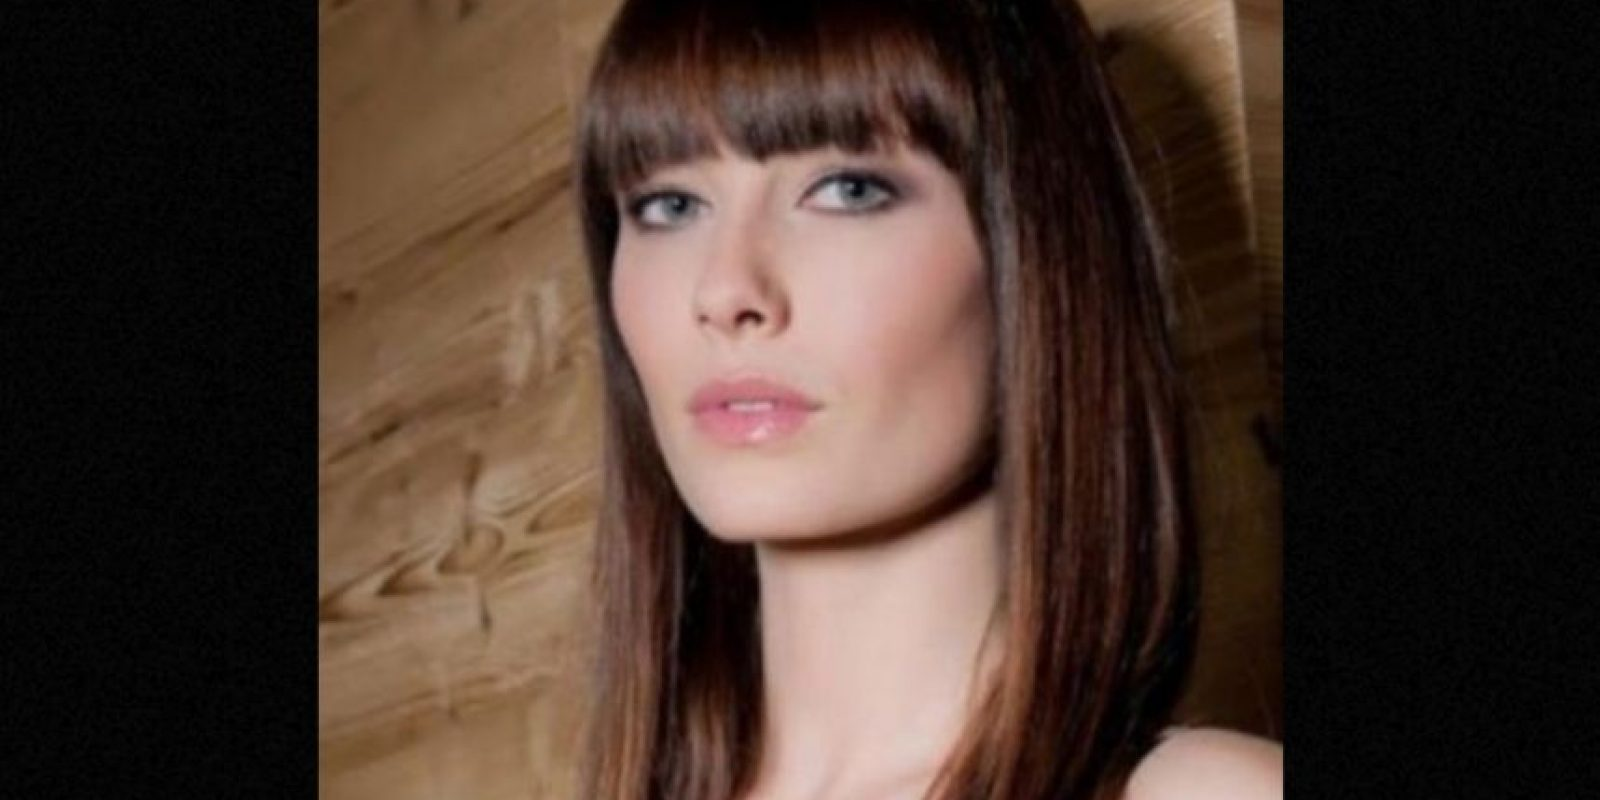 La trágica muerte de Miss Austria, perdió la vida al caer en una montaña Foto:twitter.com/ena_kadic